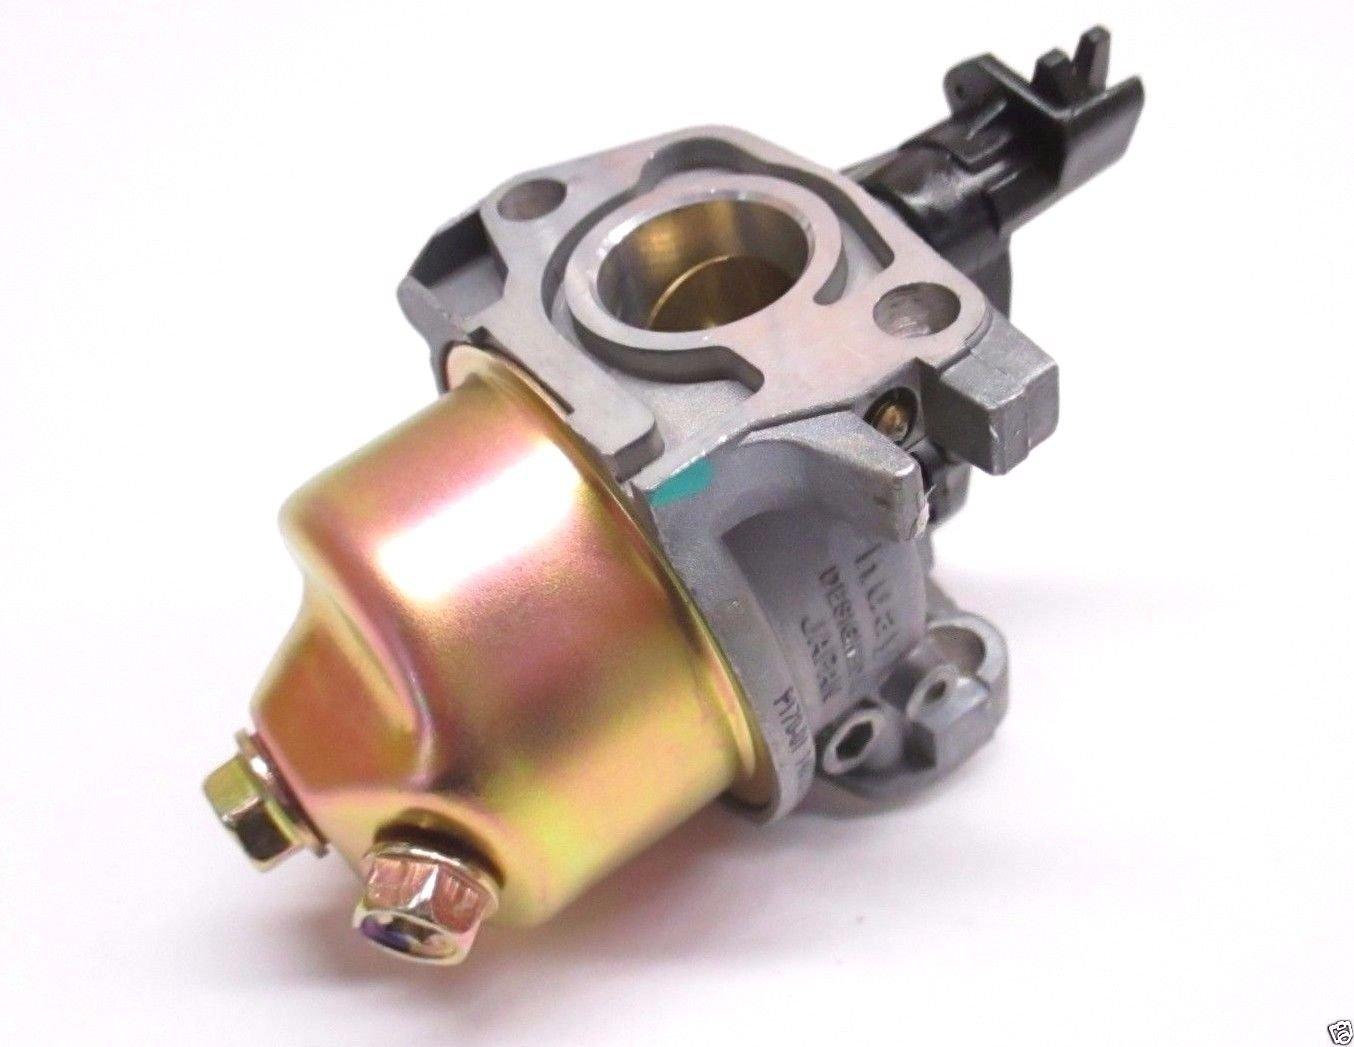 Generac Genuine 0j5343a Carburetor For Centurion 3250 Zama C1uh13 Diagram And Parts List Homelite Leaf Gp3250 0057900 0059820 Oem Garden Outdoor